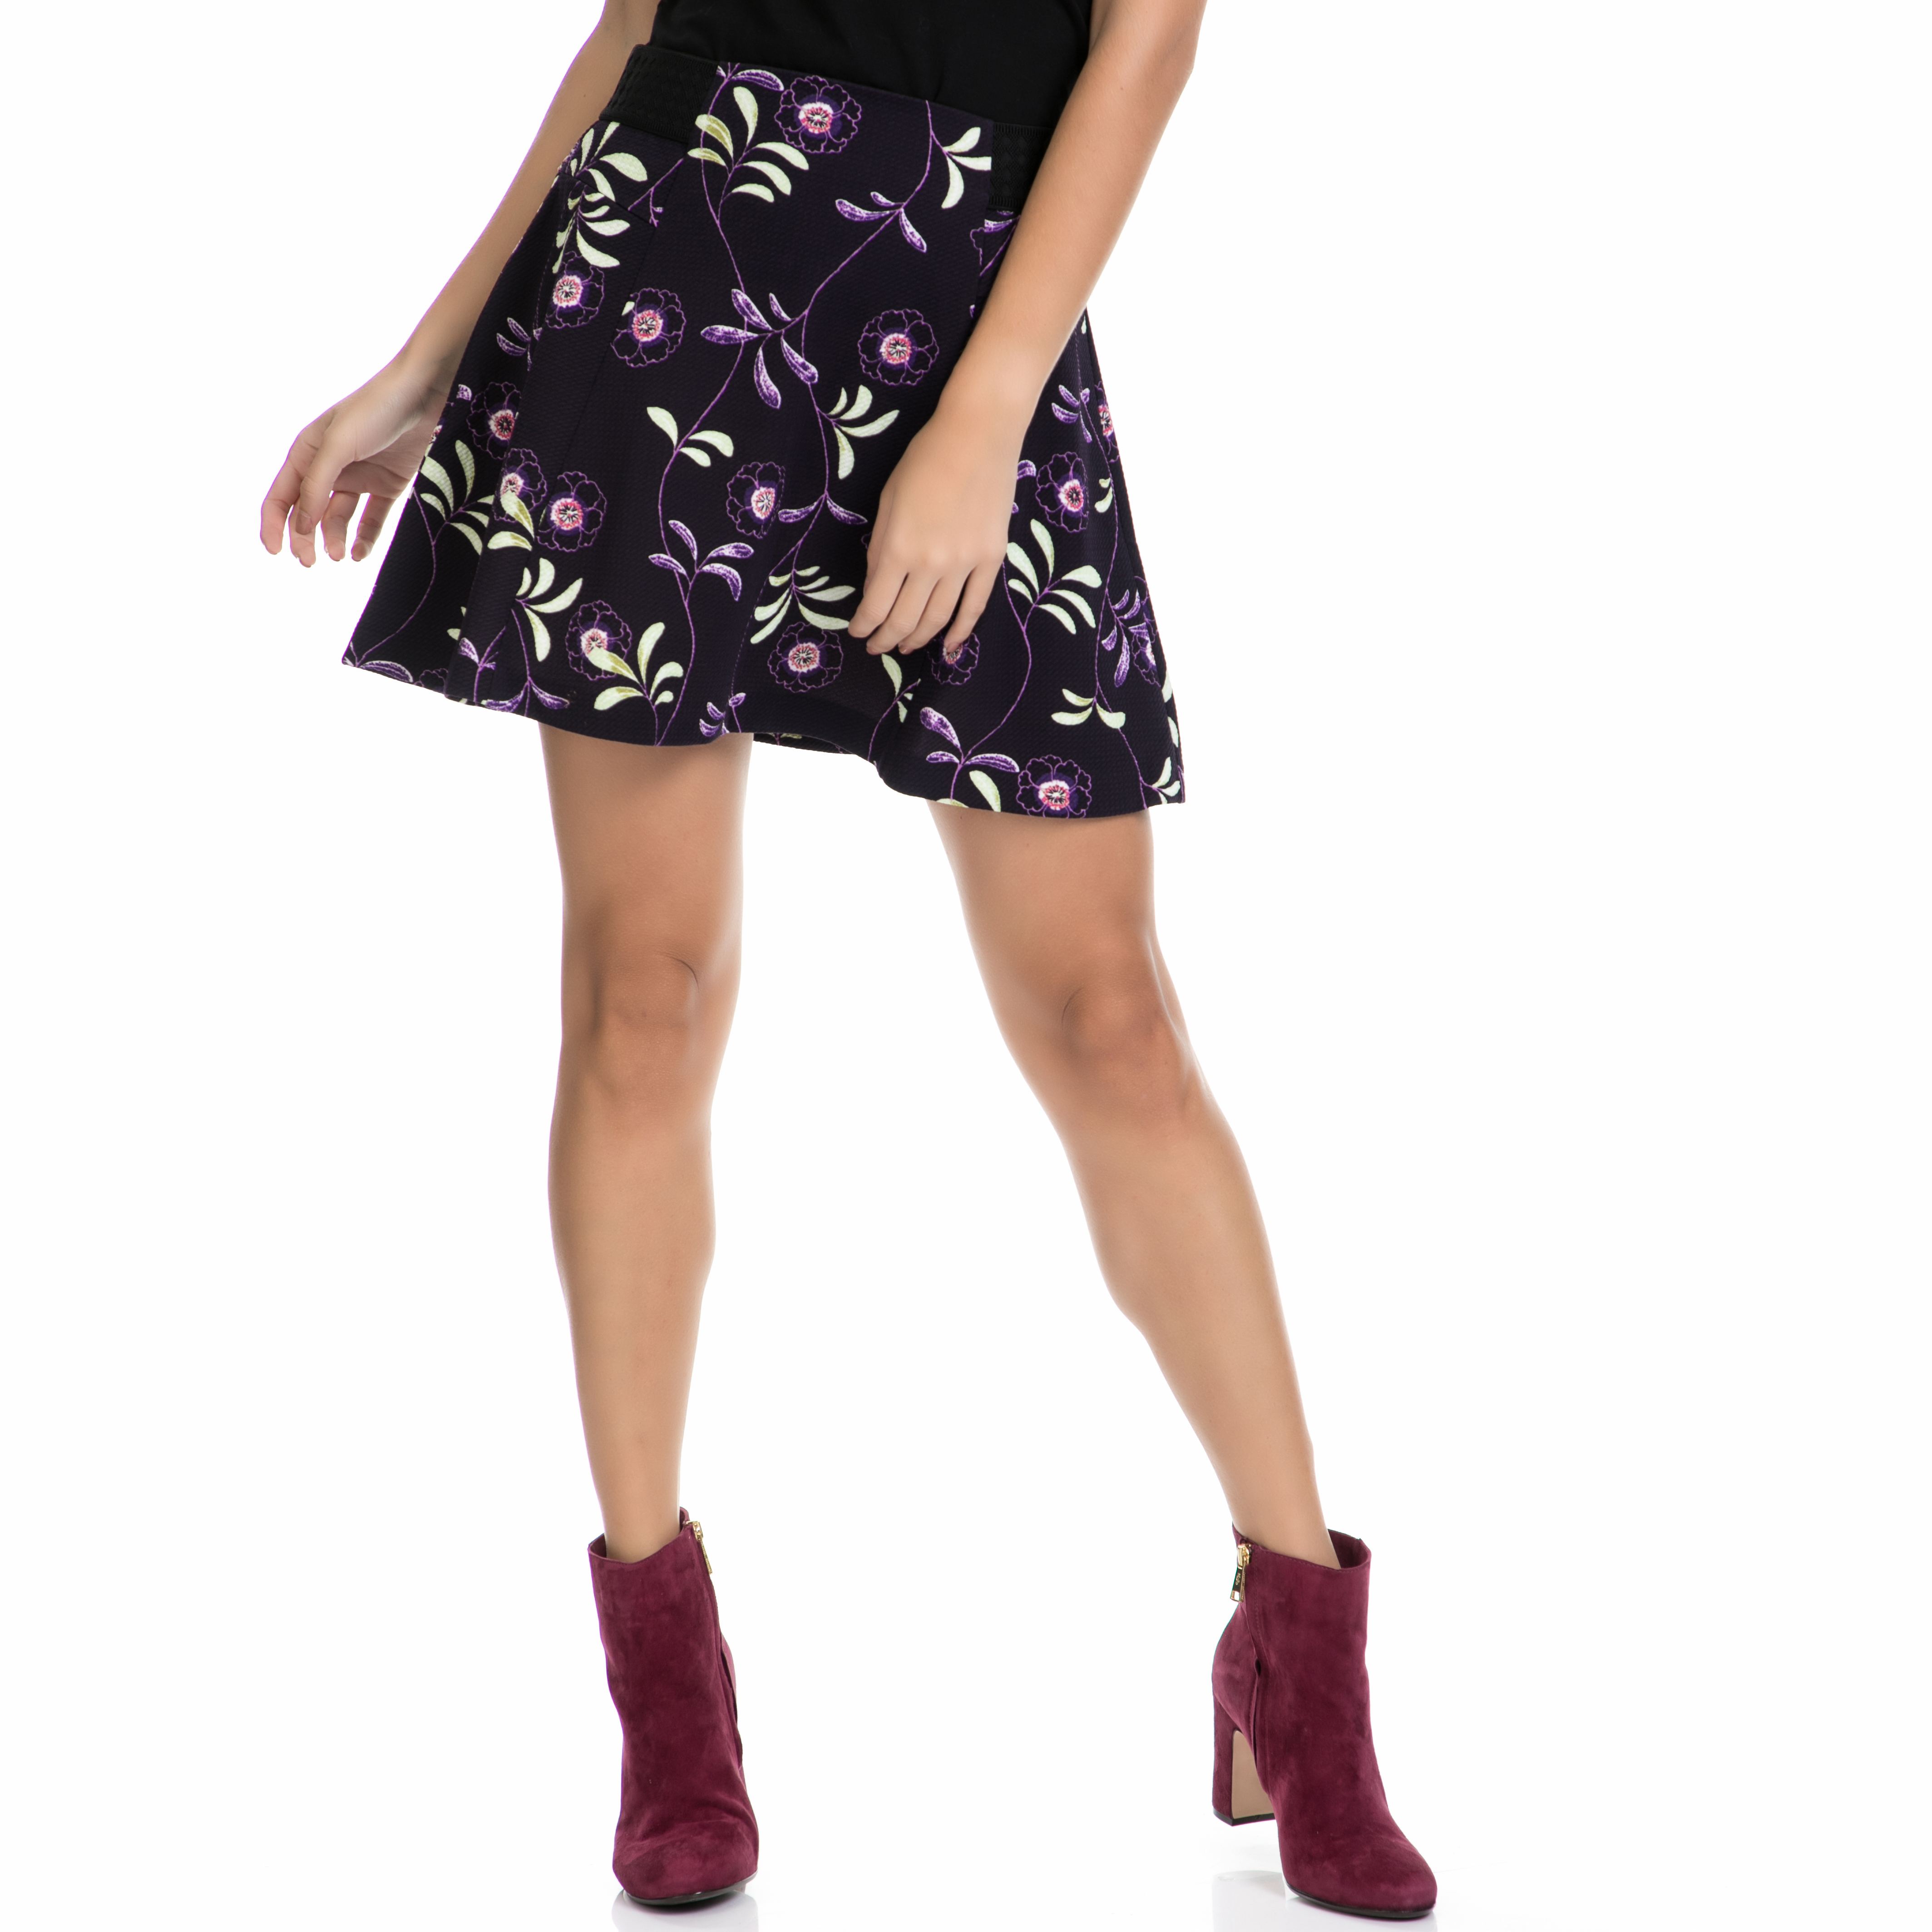 JUICY COUTURE – Γυναικεία φούστα KNT ROMA FLORAL TEXTURE FLIRTY μωβ